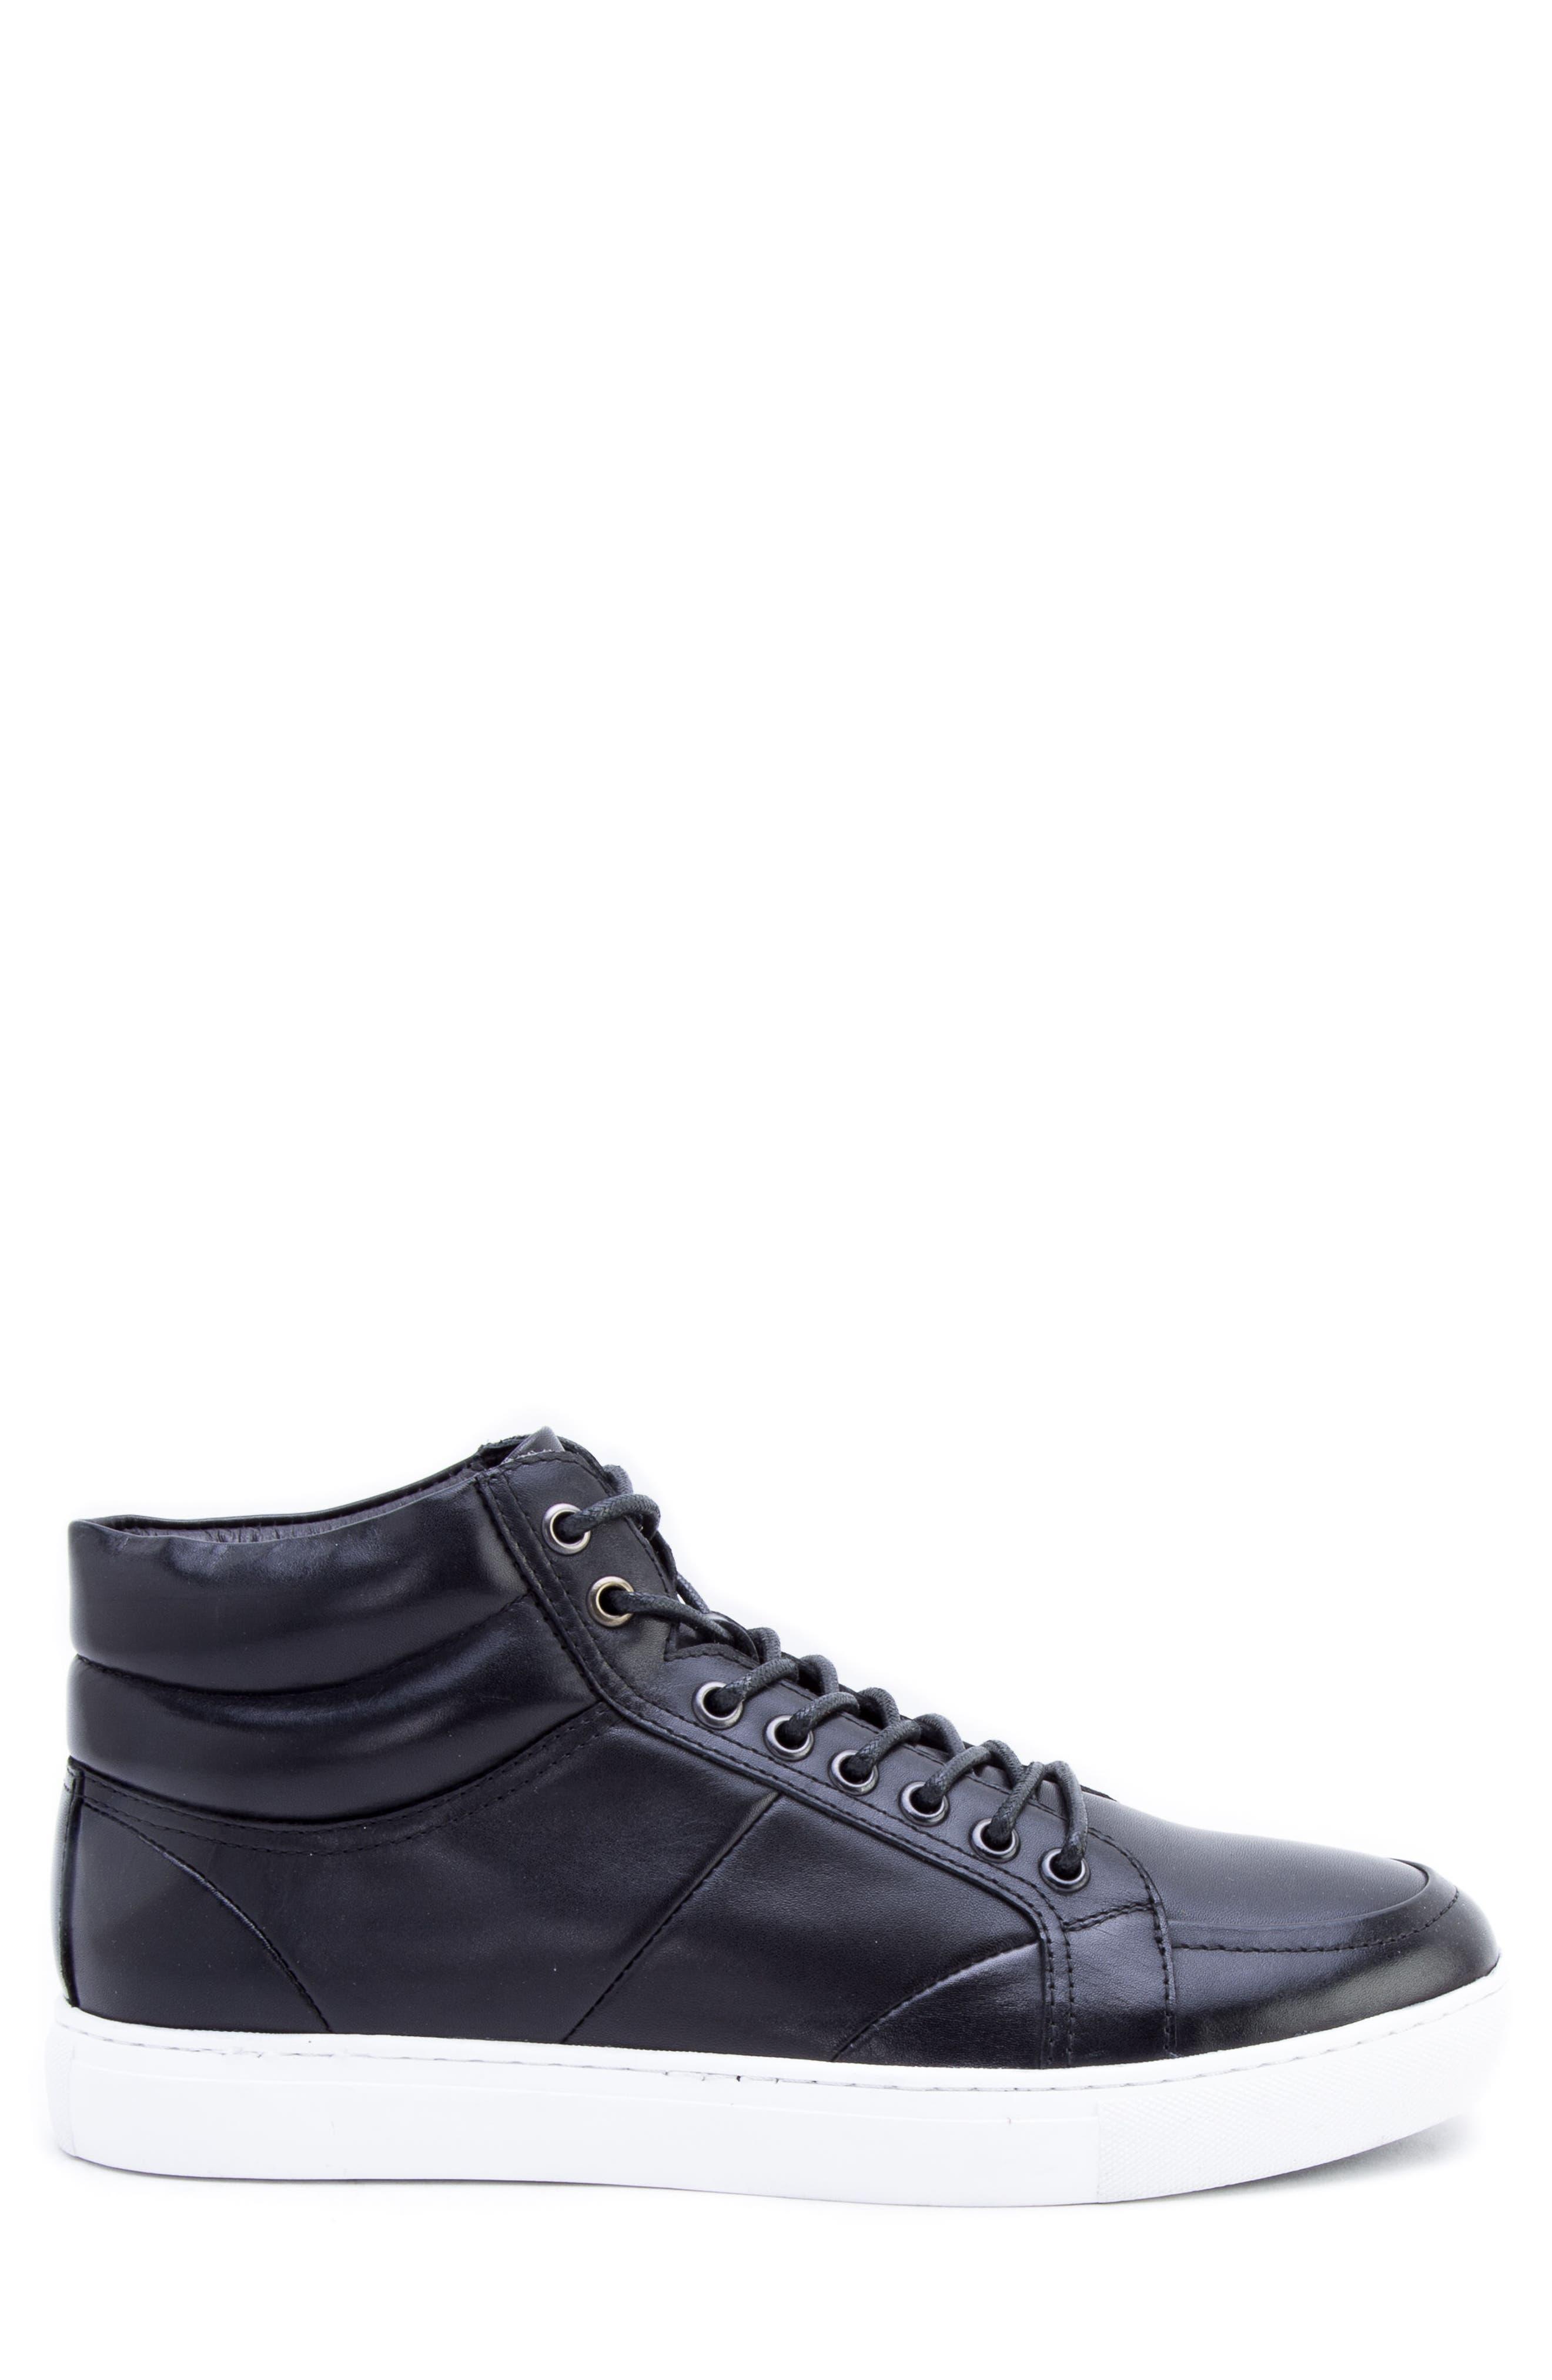 Tassel Mid Top Sneaker,                             Alternate thumbnail 3, color,                             BLACK LEATHER